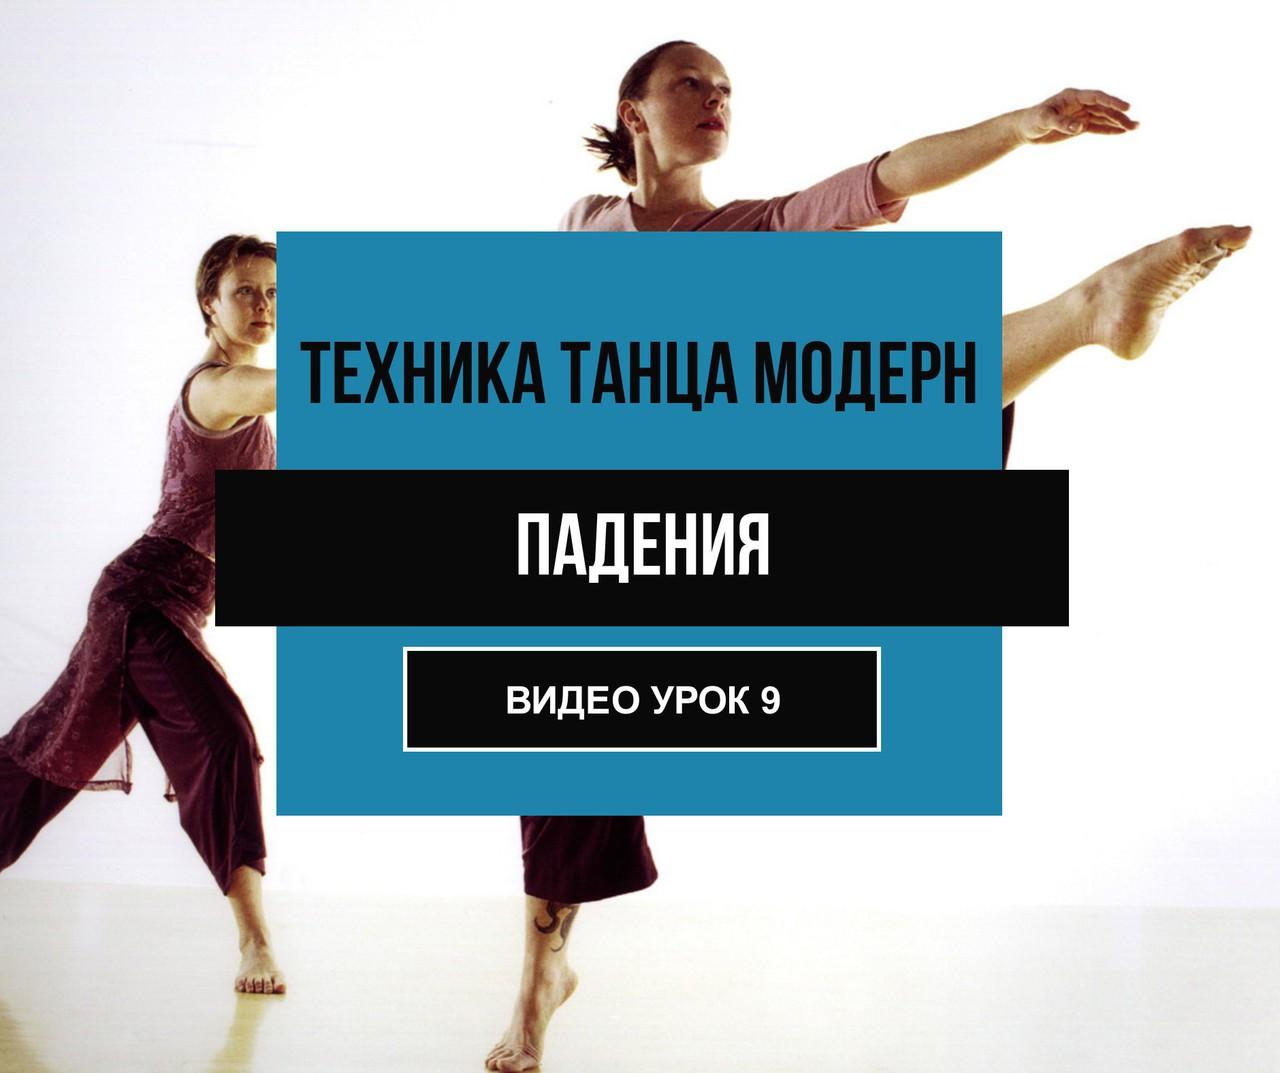 Паденье в танце модерн